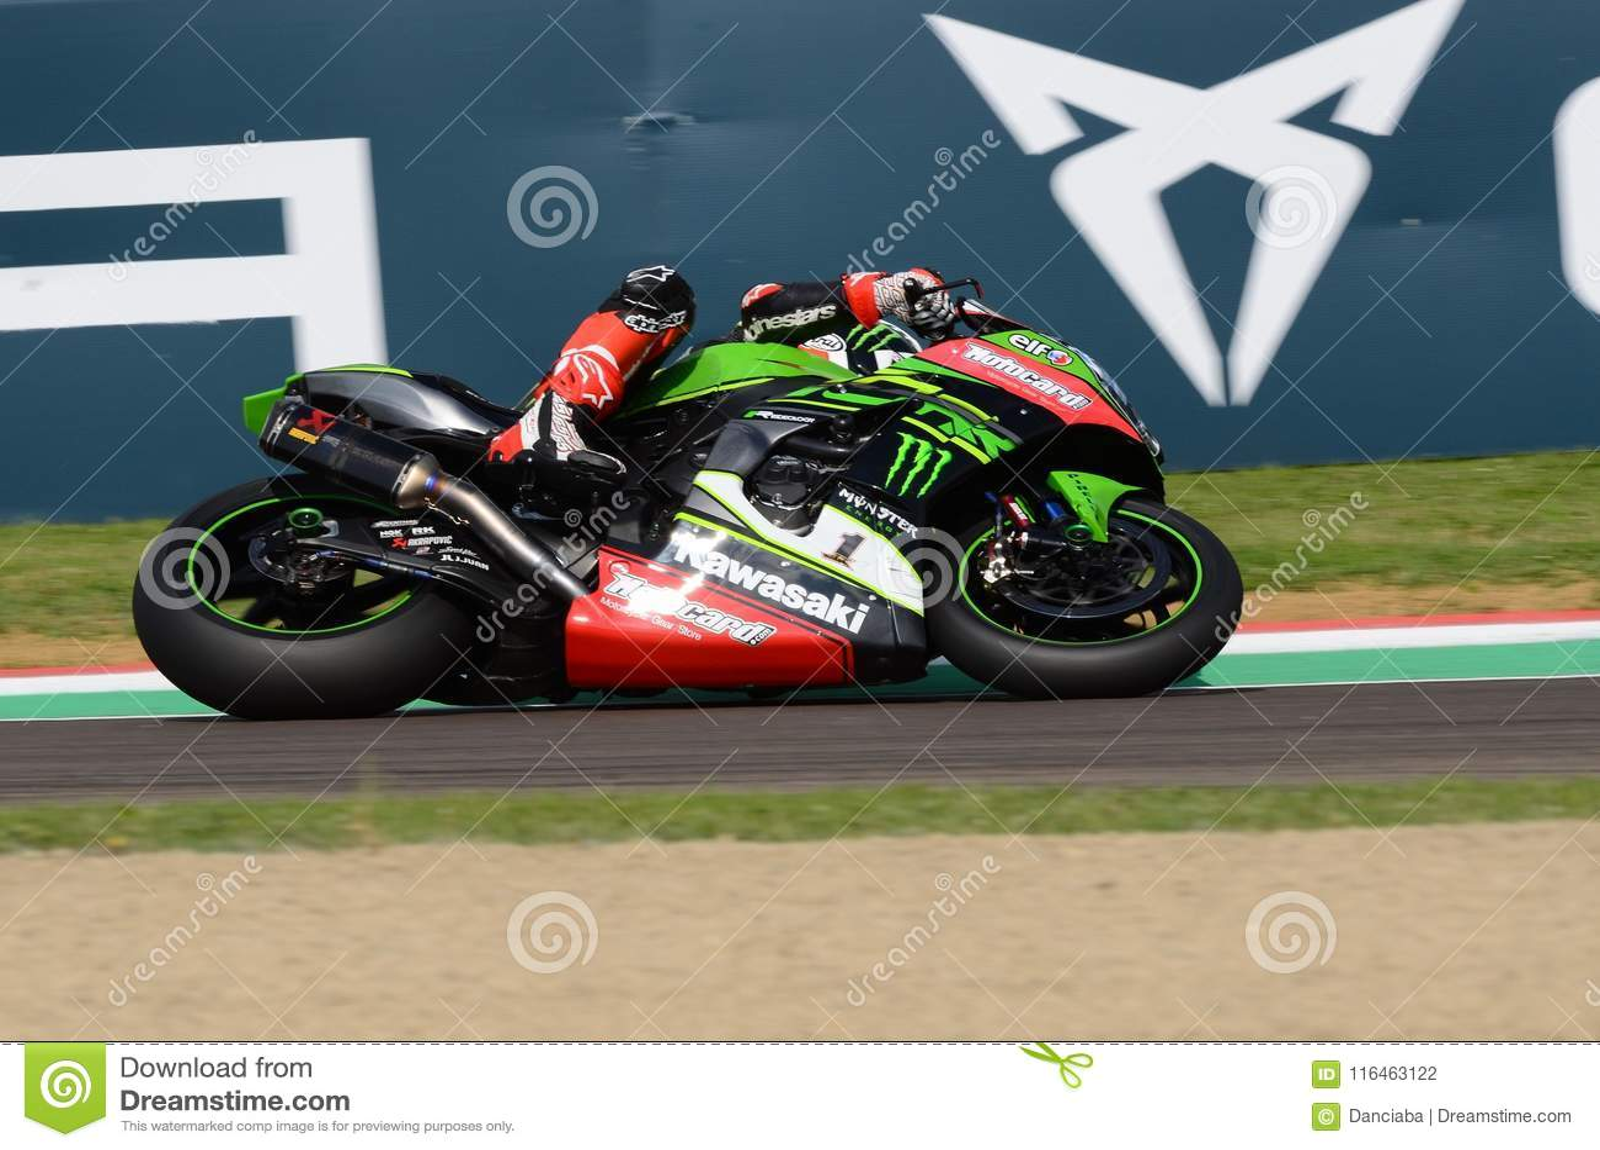 San Marino Italy - Maj 11, 2018: Jonathan Rea GBR Kawasaki ZX-10RR Kawasaki Racing Team, i handling